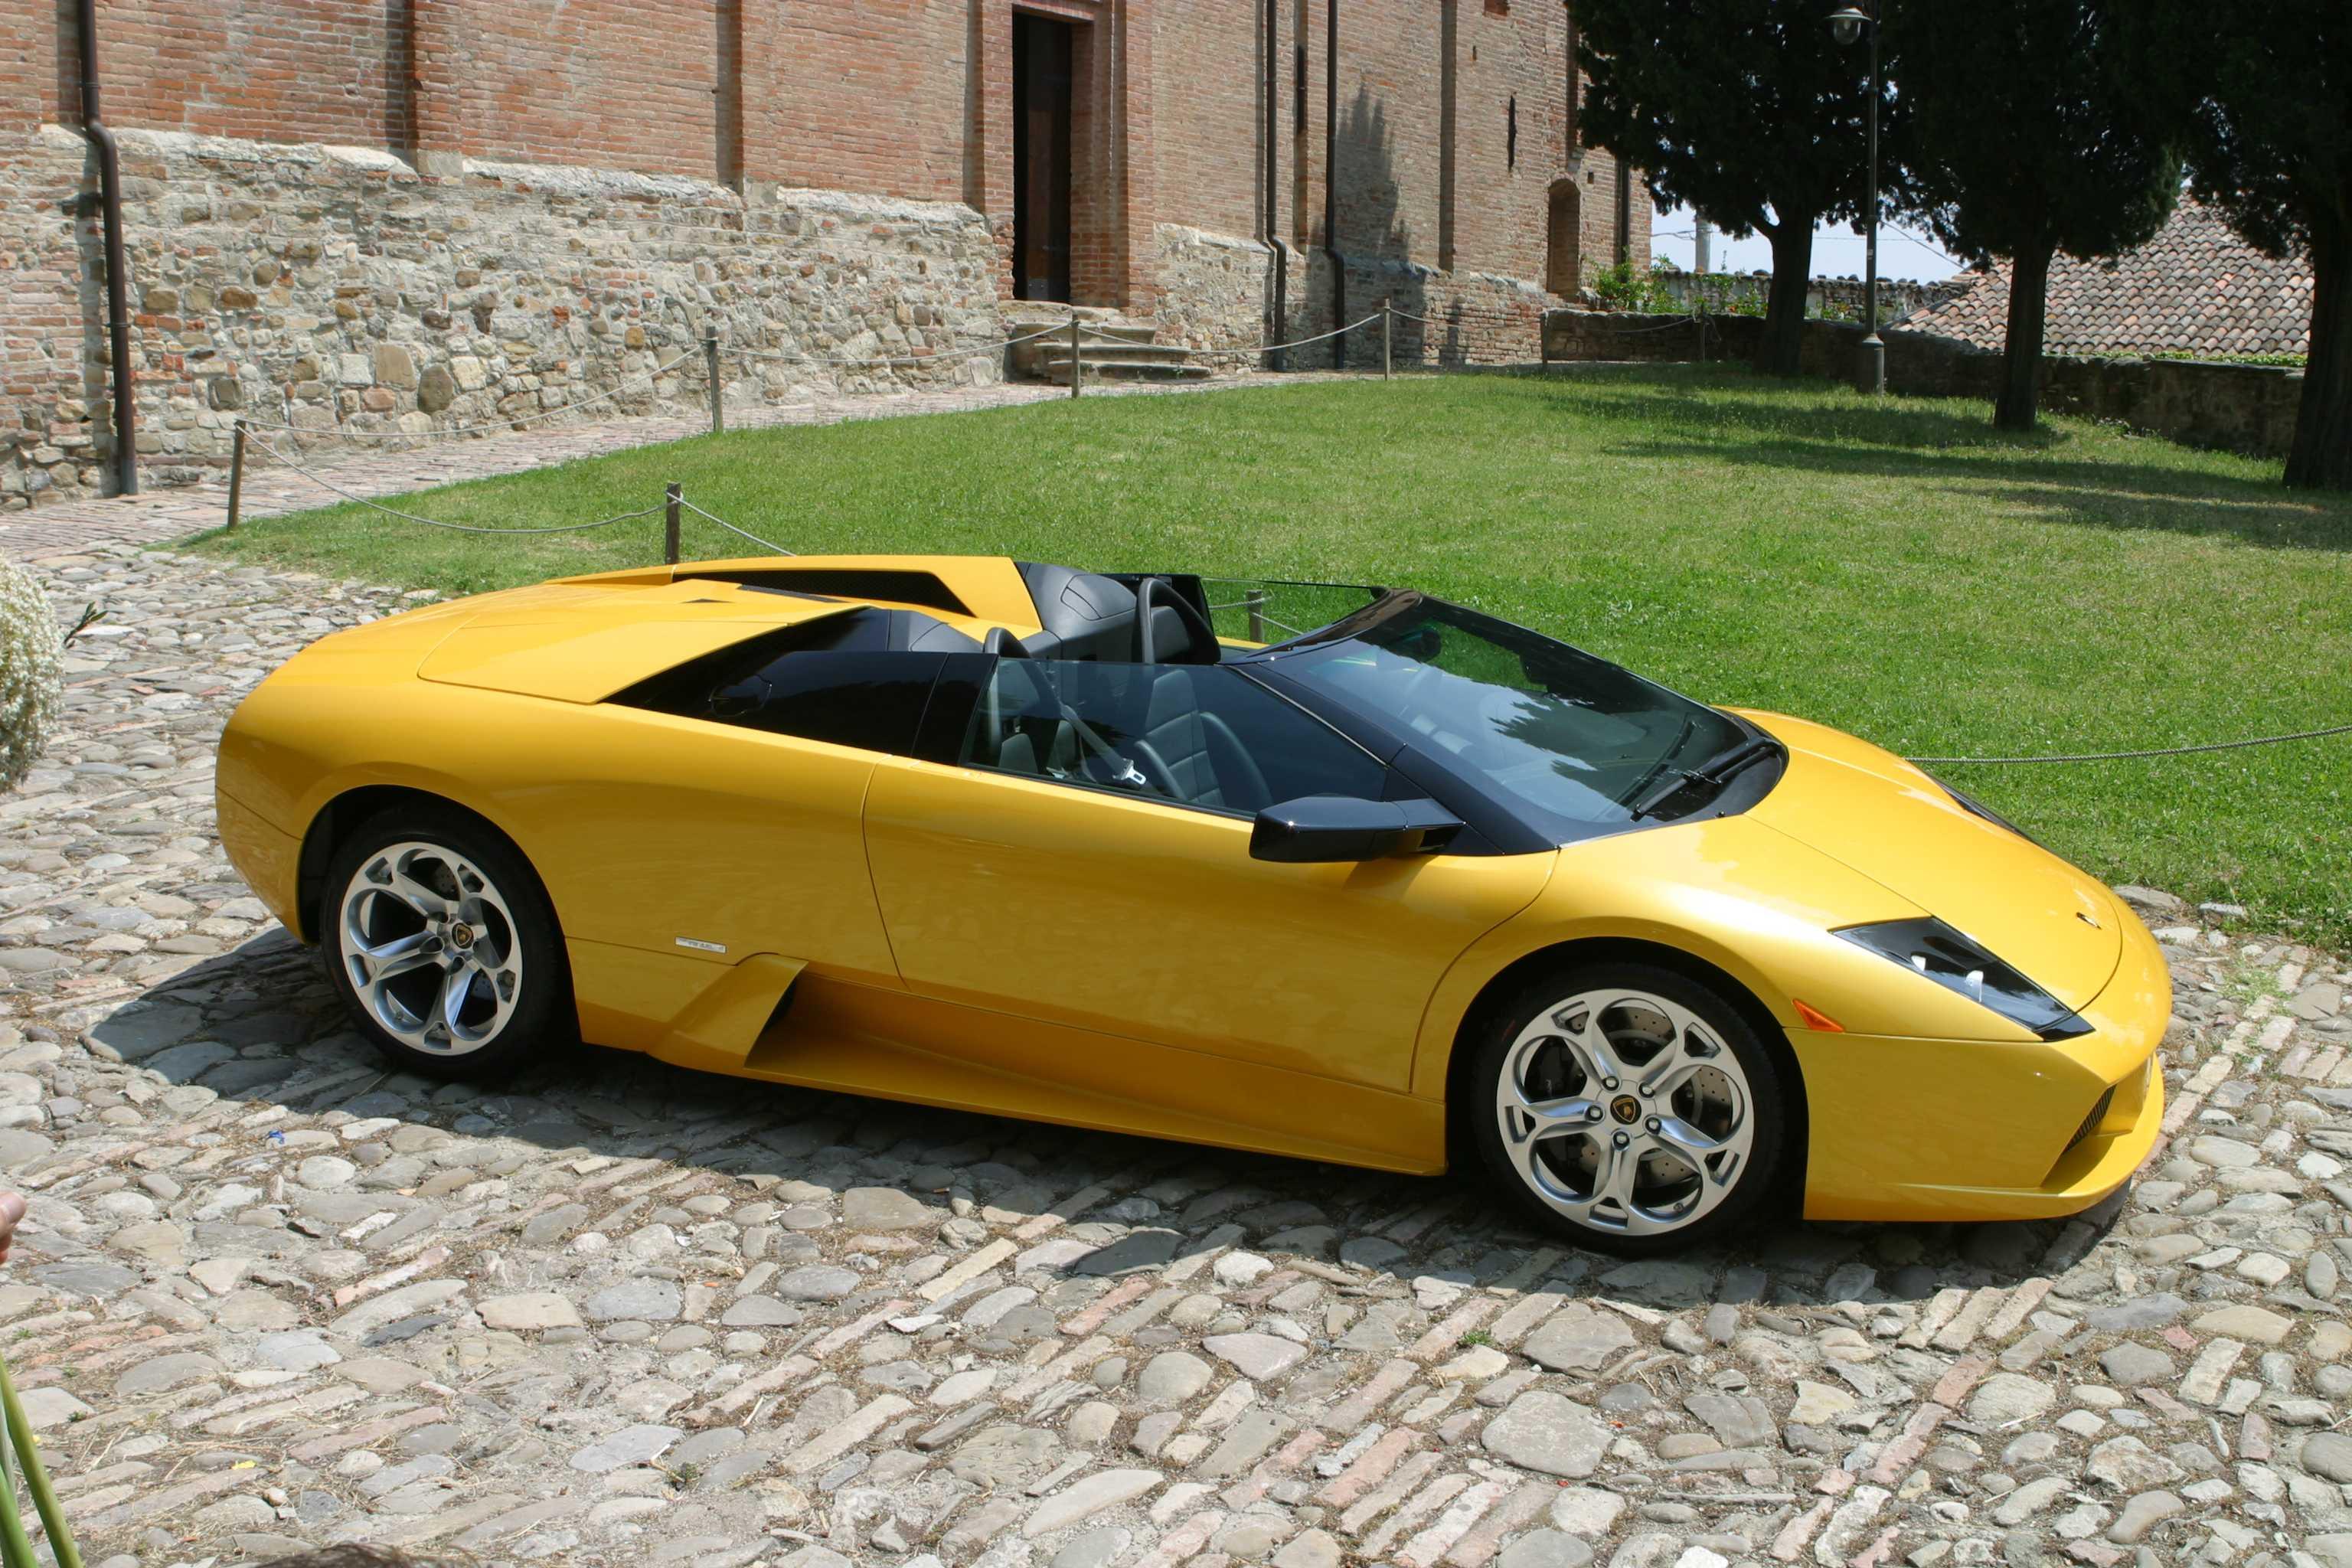 Lamborghini Murcielago Roadster 1st Generation